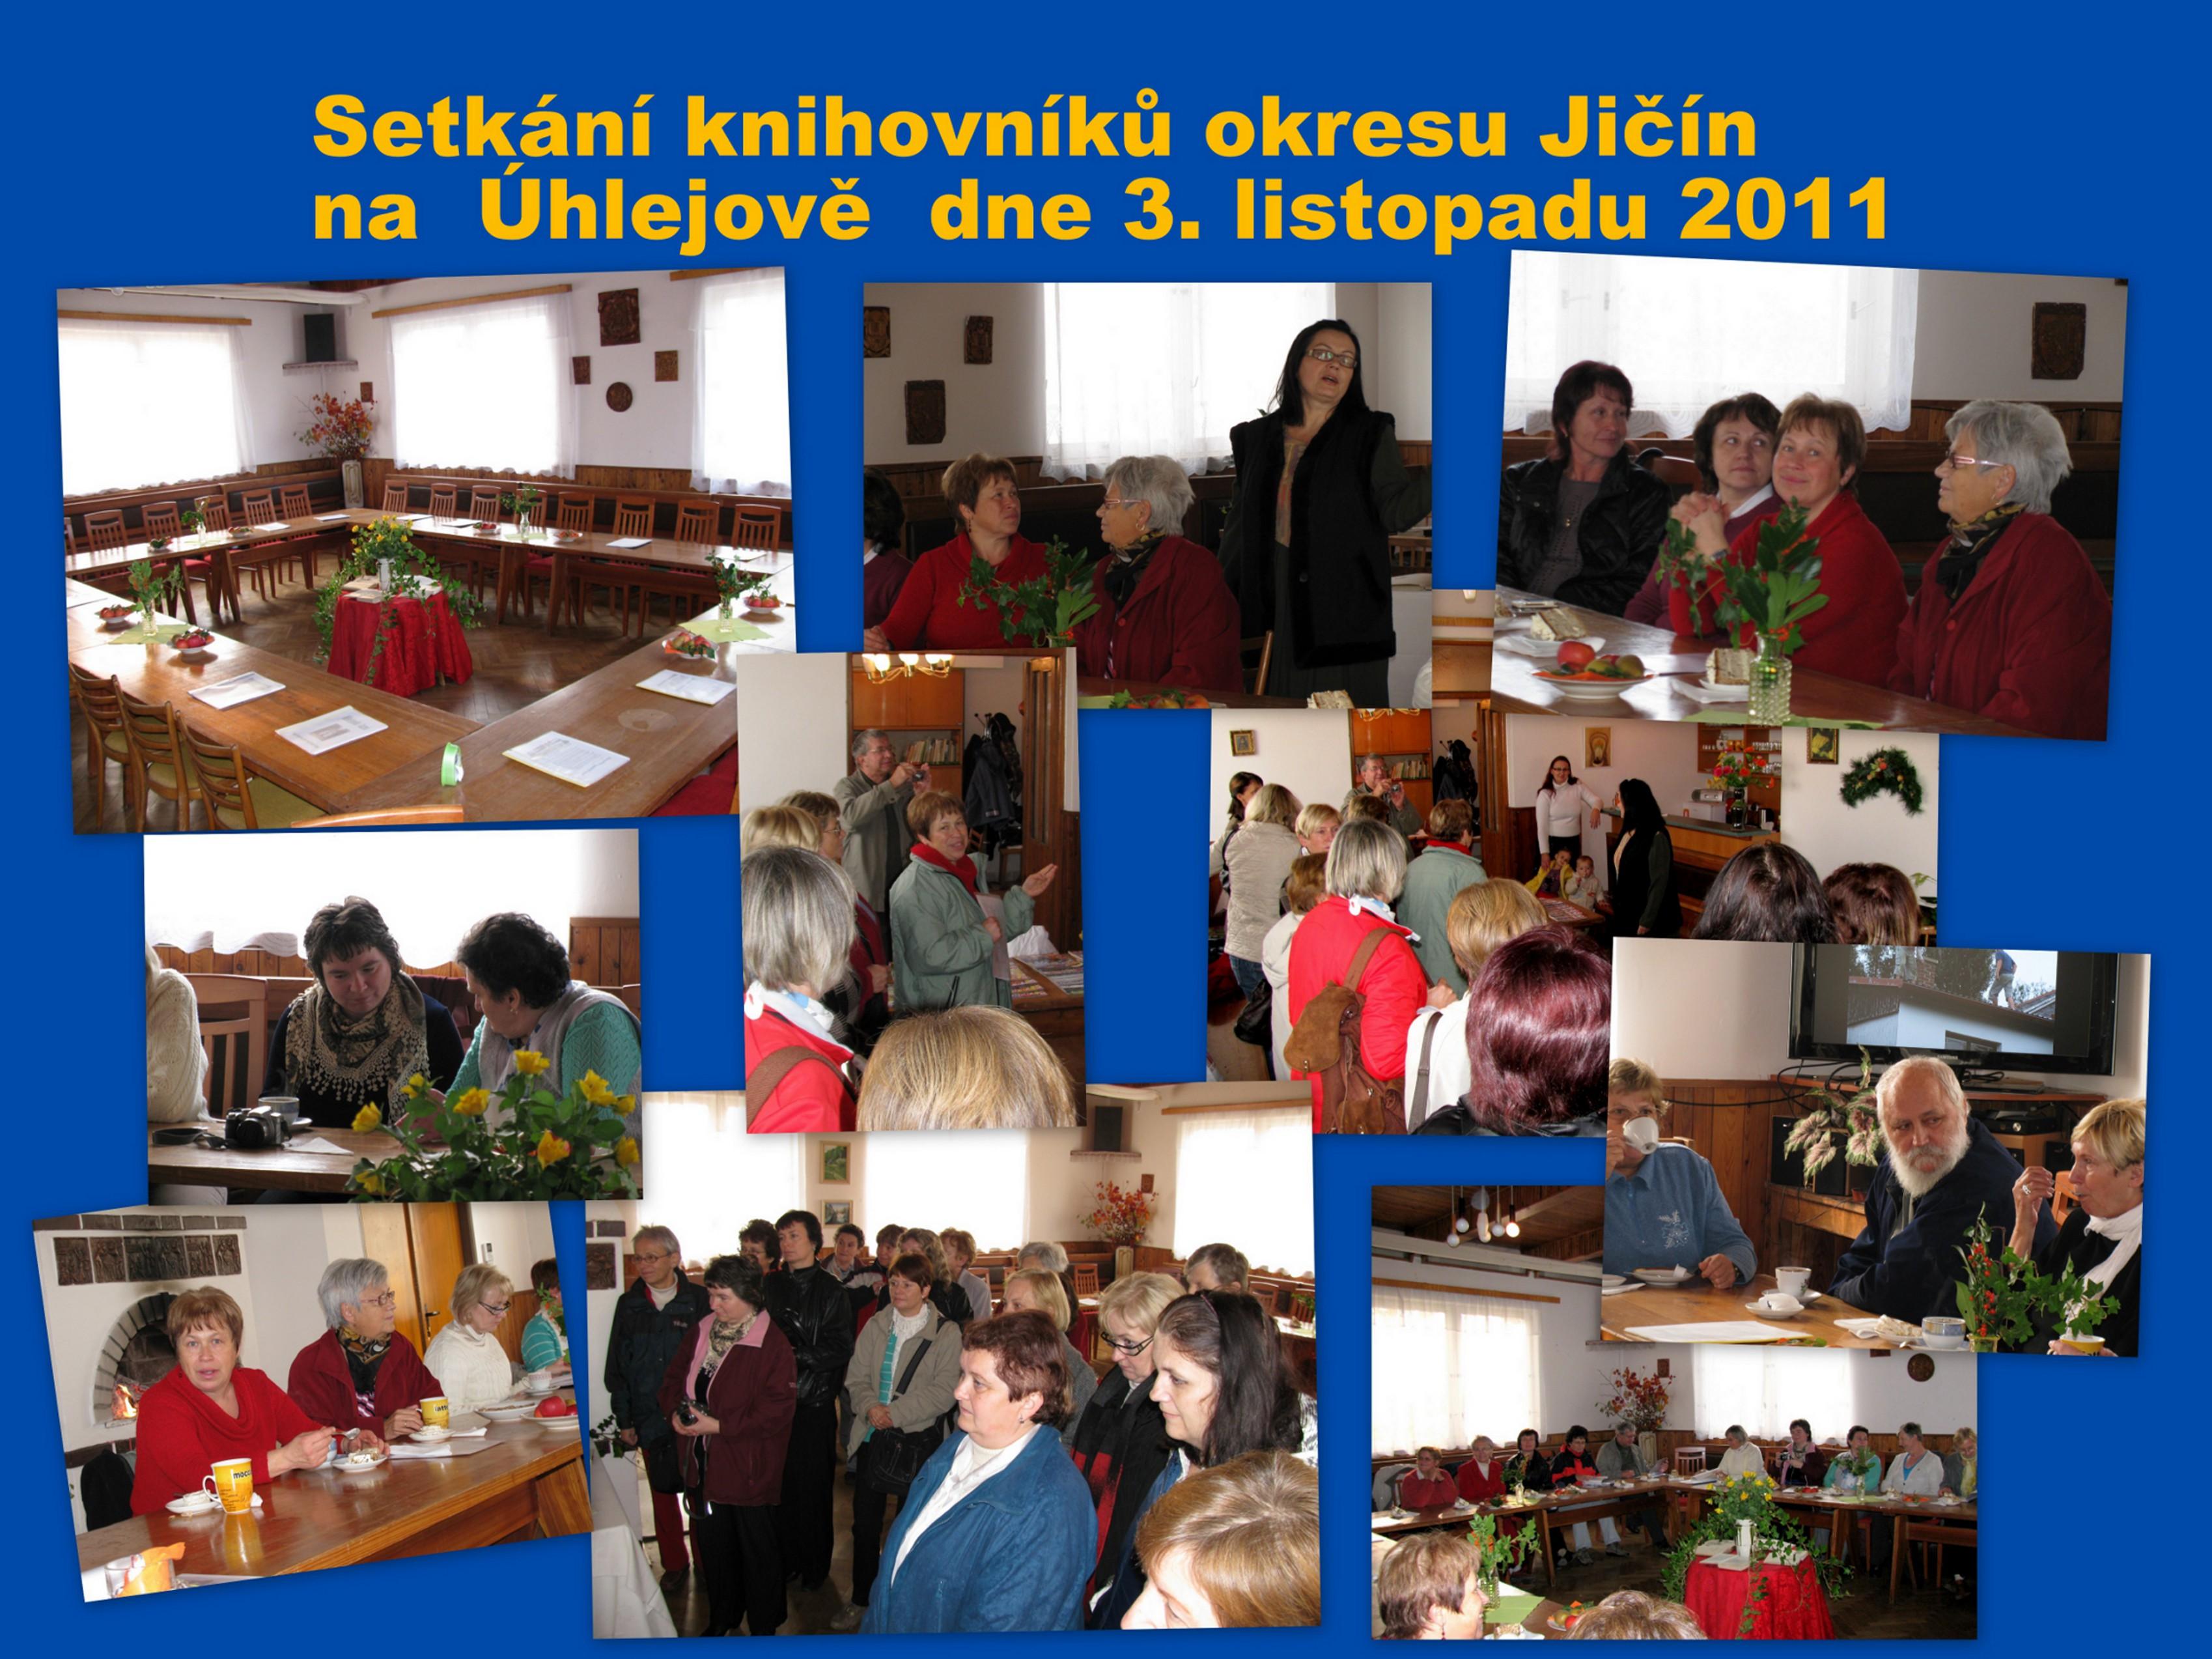 OBRÁZEK : setkani_knihovniku_na_uhlejove_kolaz_-xxx2xxx_-_listzopasd_2011.jpg